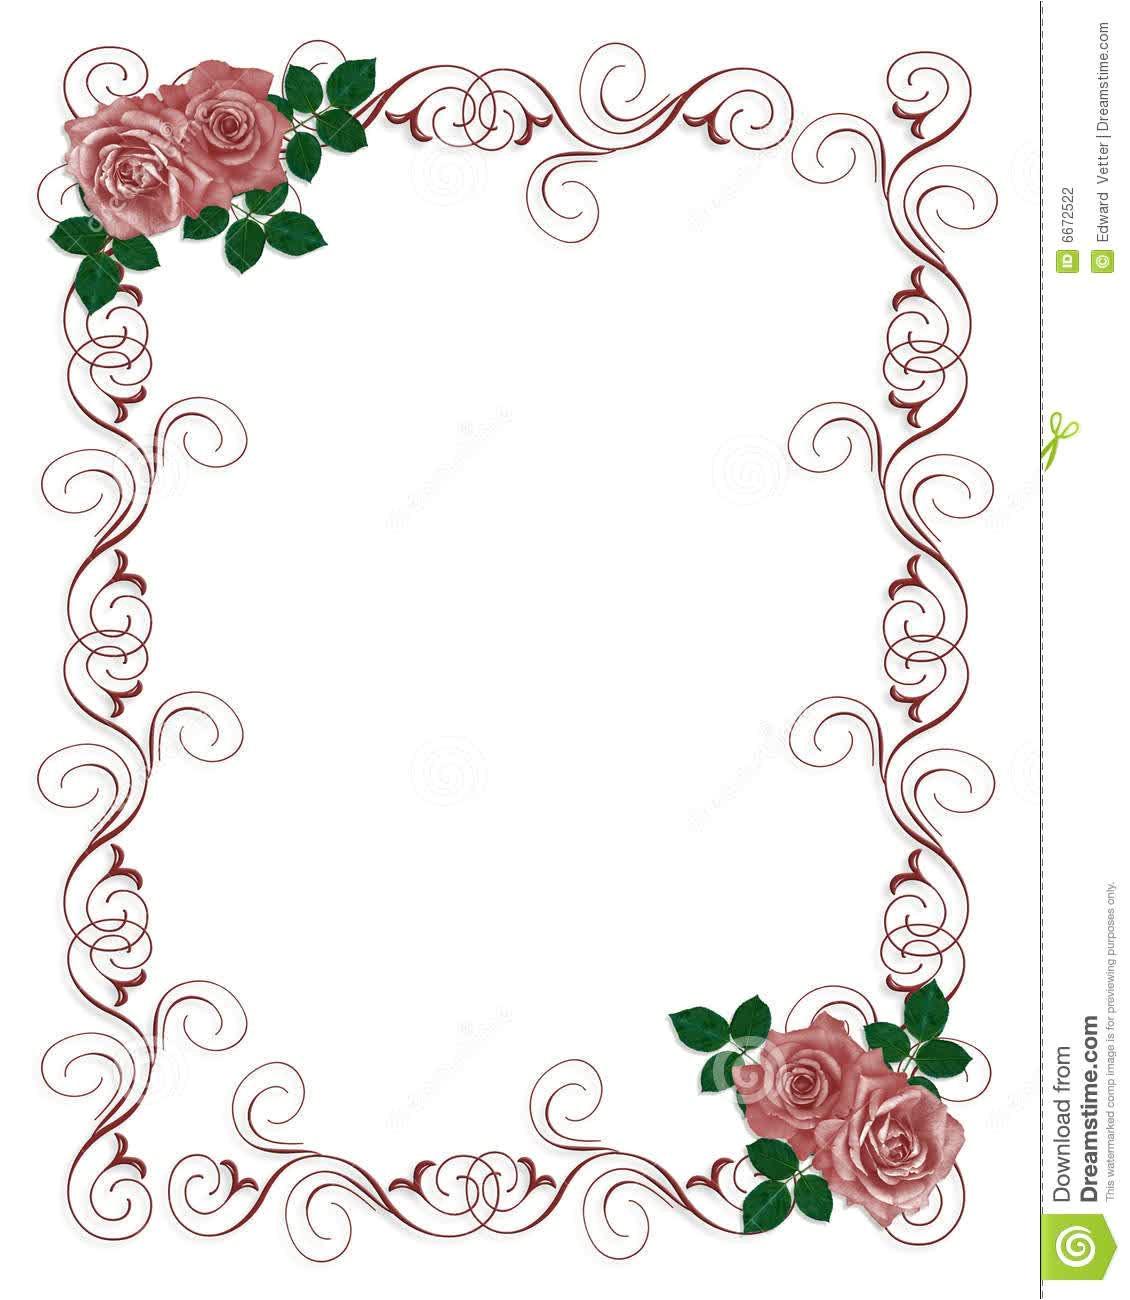 Blank Wedding Invitation Template Floral Blank Wedding Invitation Templates Wedding and Bridal